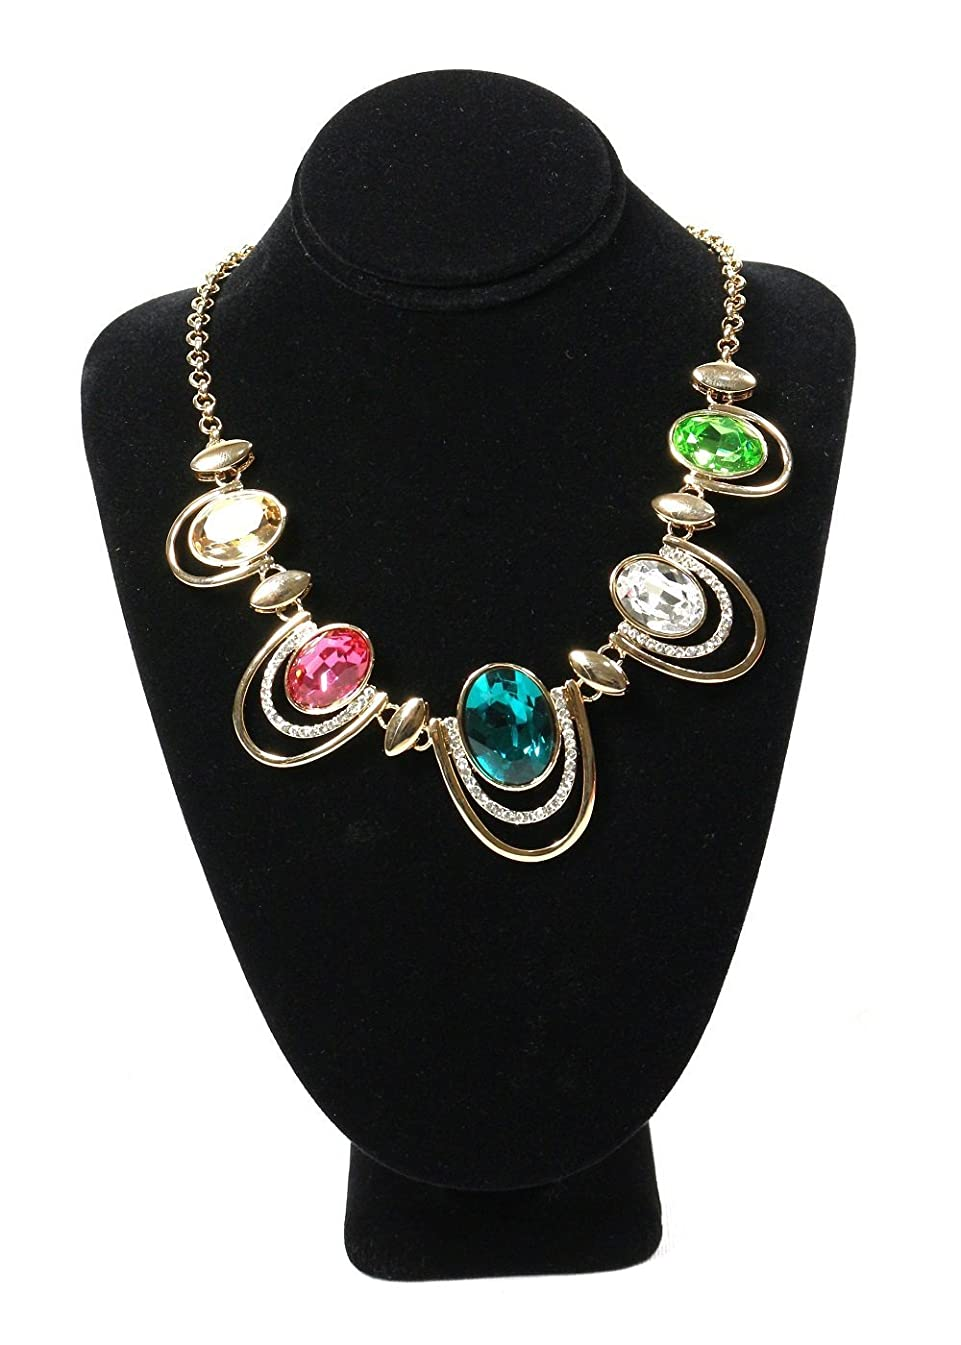 Bejeweled Display Premium Quality Black Velvet Graceful Necklace Bust Jewelry Display 11